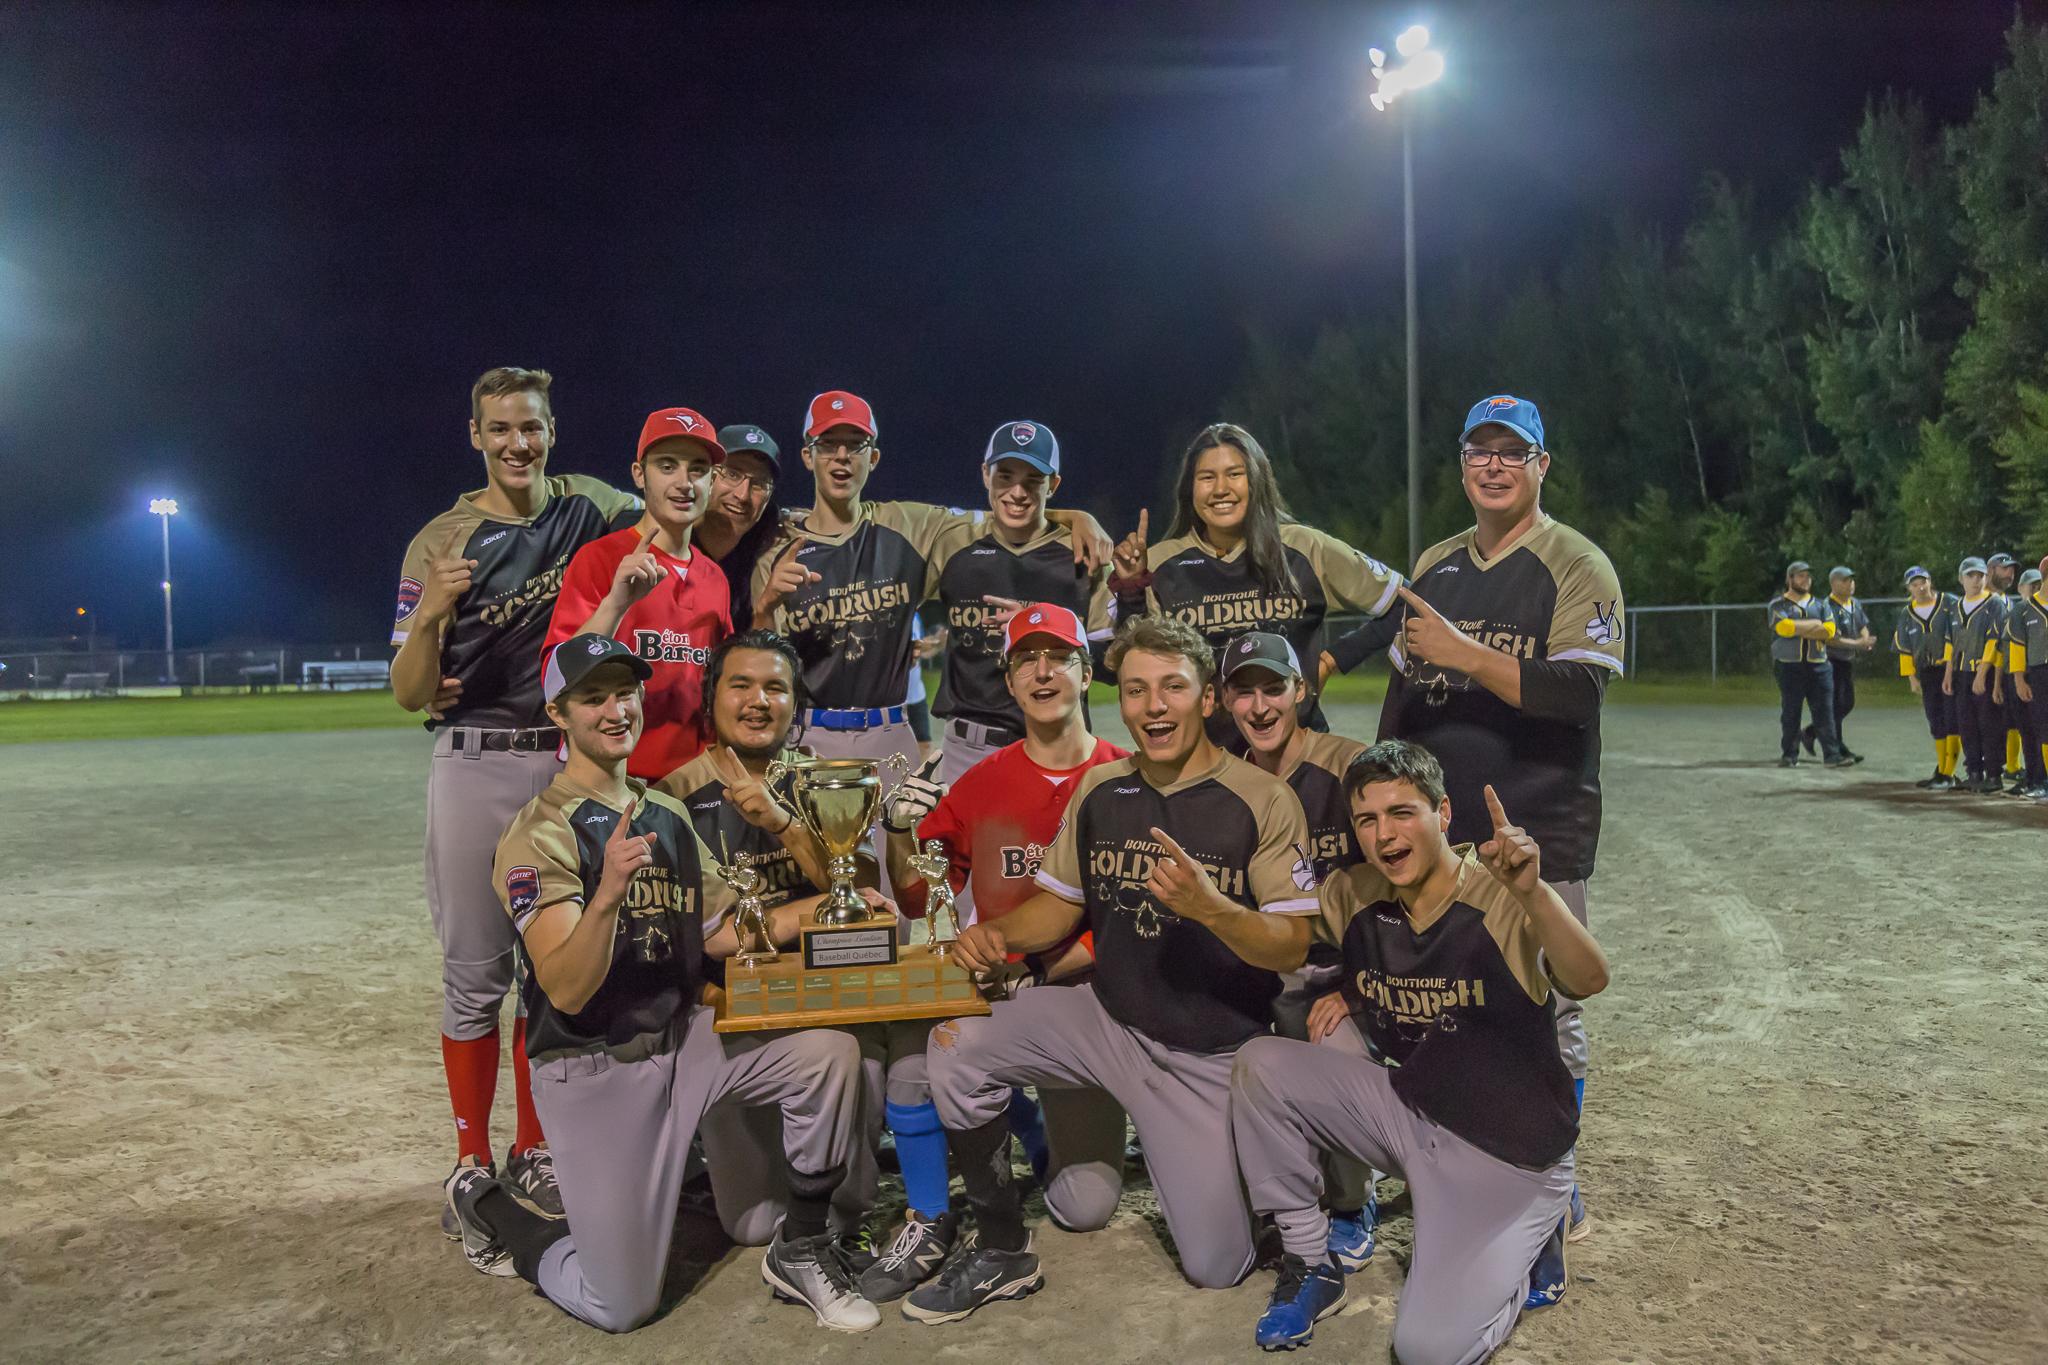 Baseball Val-d'Or - Val-d'Or Midget